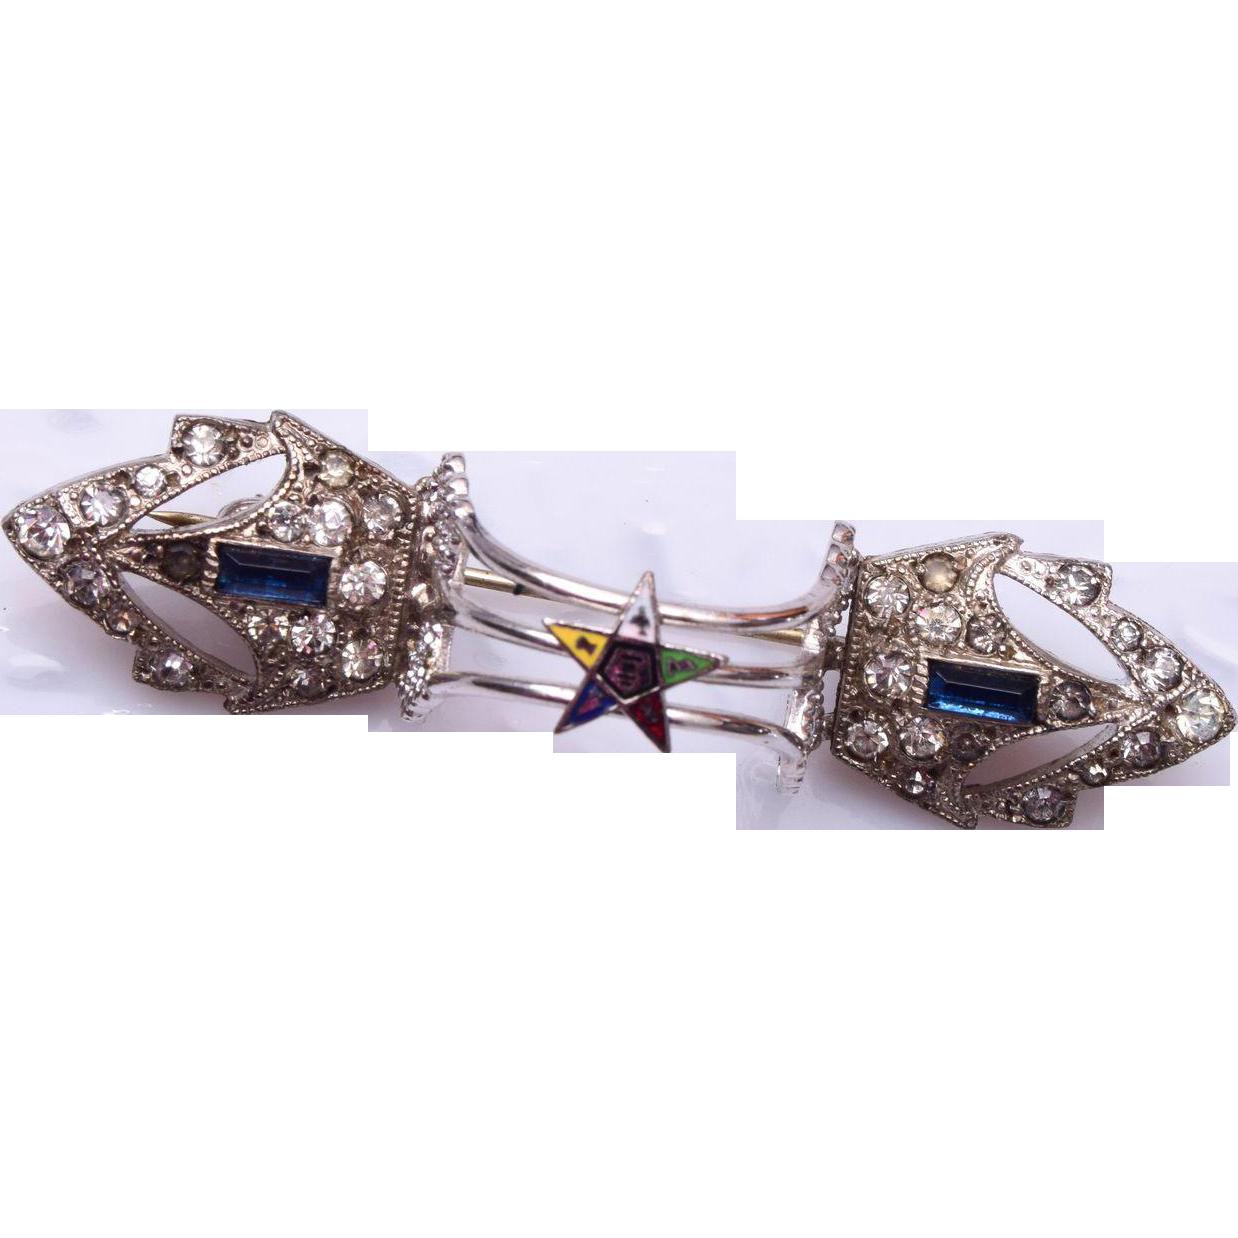 Eastern Star Pot Metal Scarf Clip